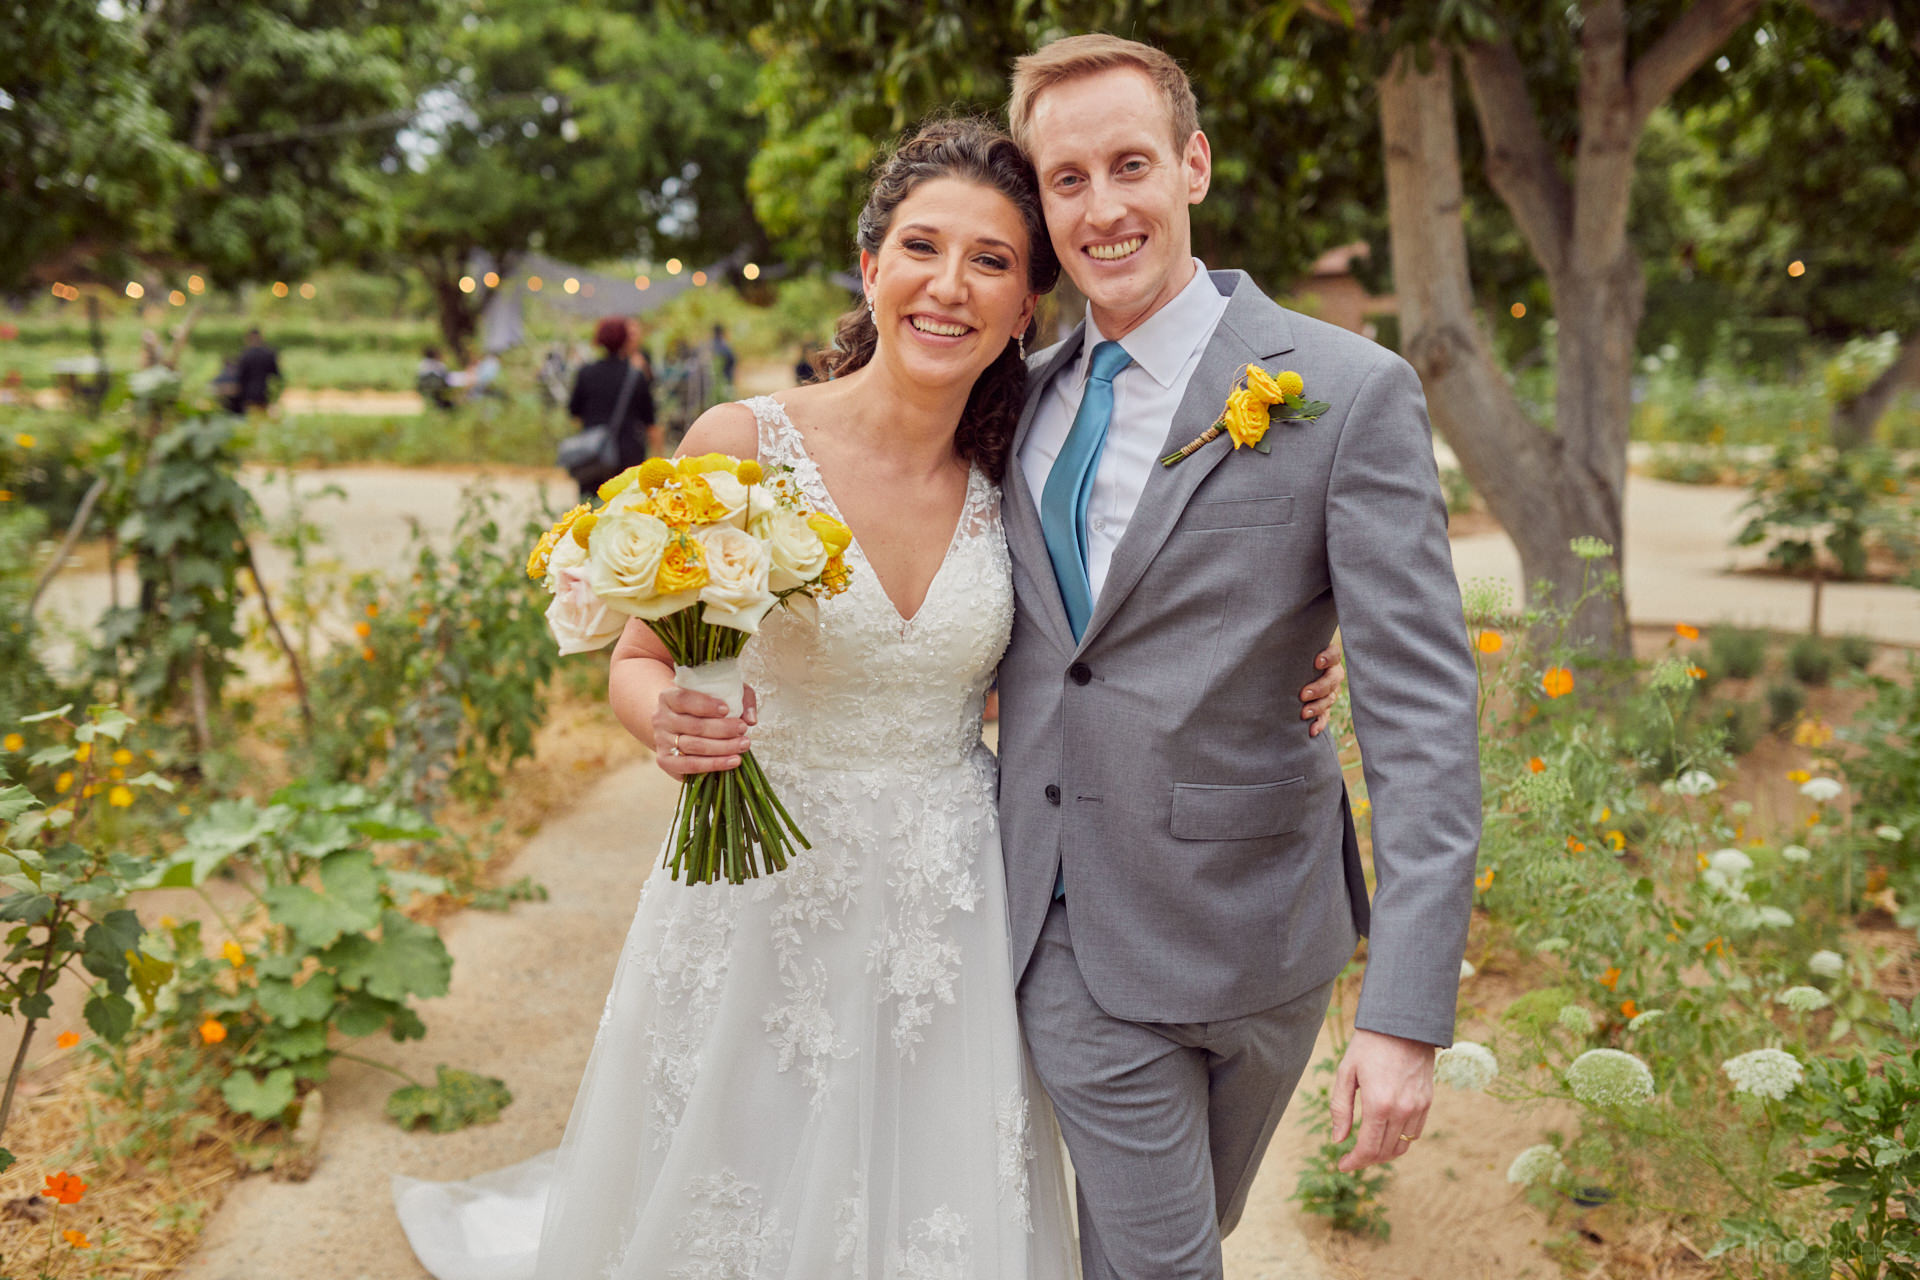 Wedding In Cabo San Lucas Or San Jose Del Cabo - Hilary & Bryan Flora Wedding